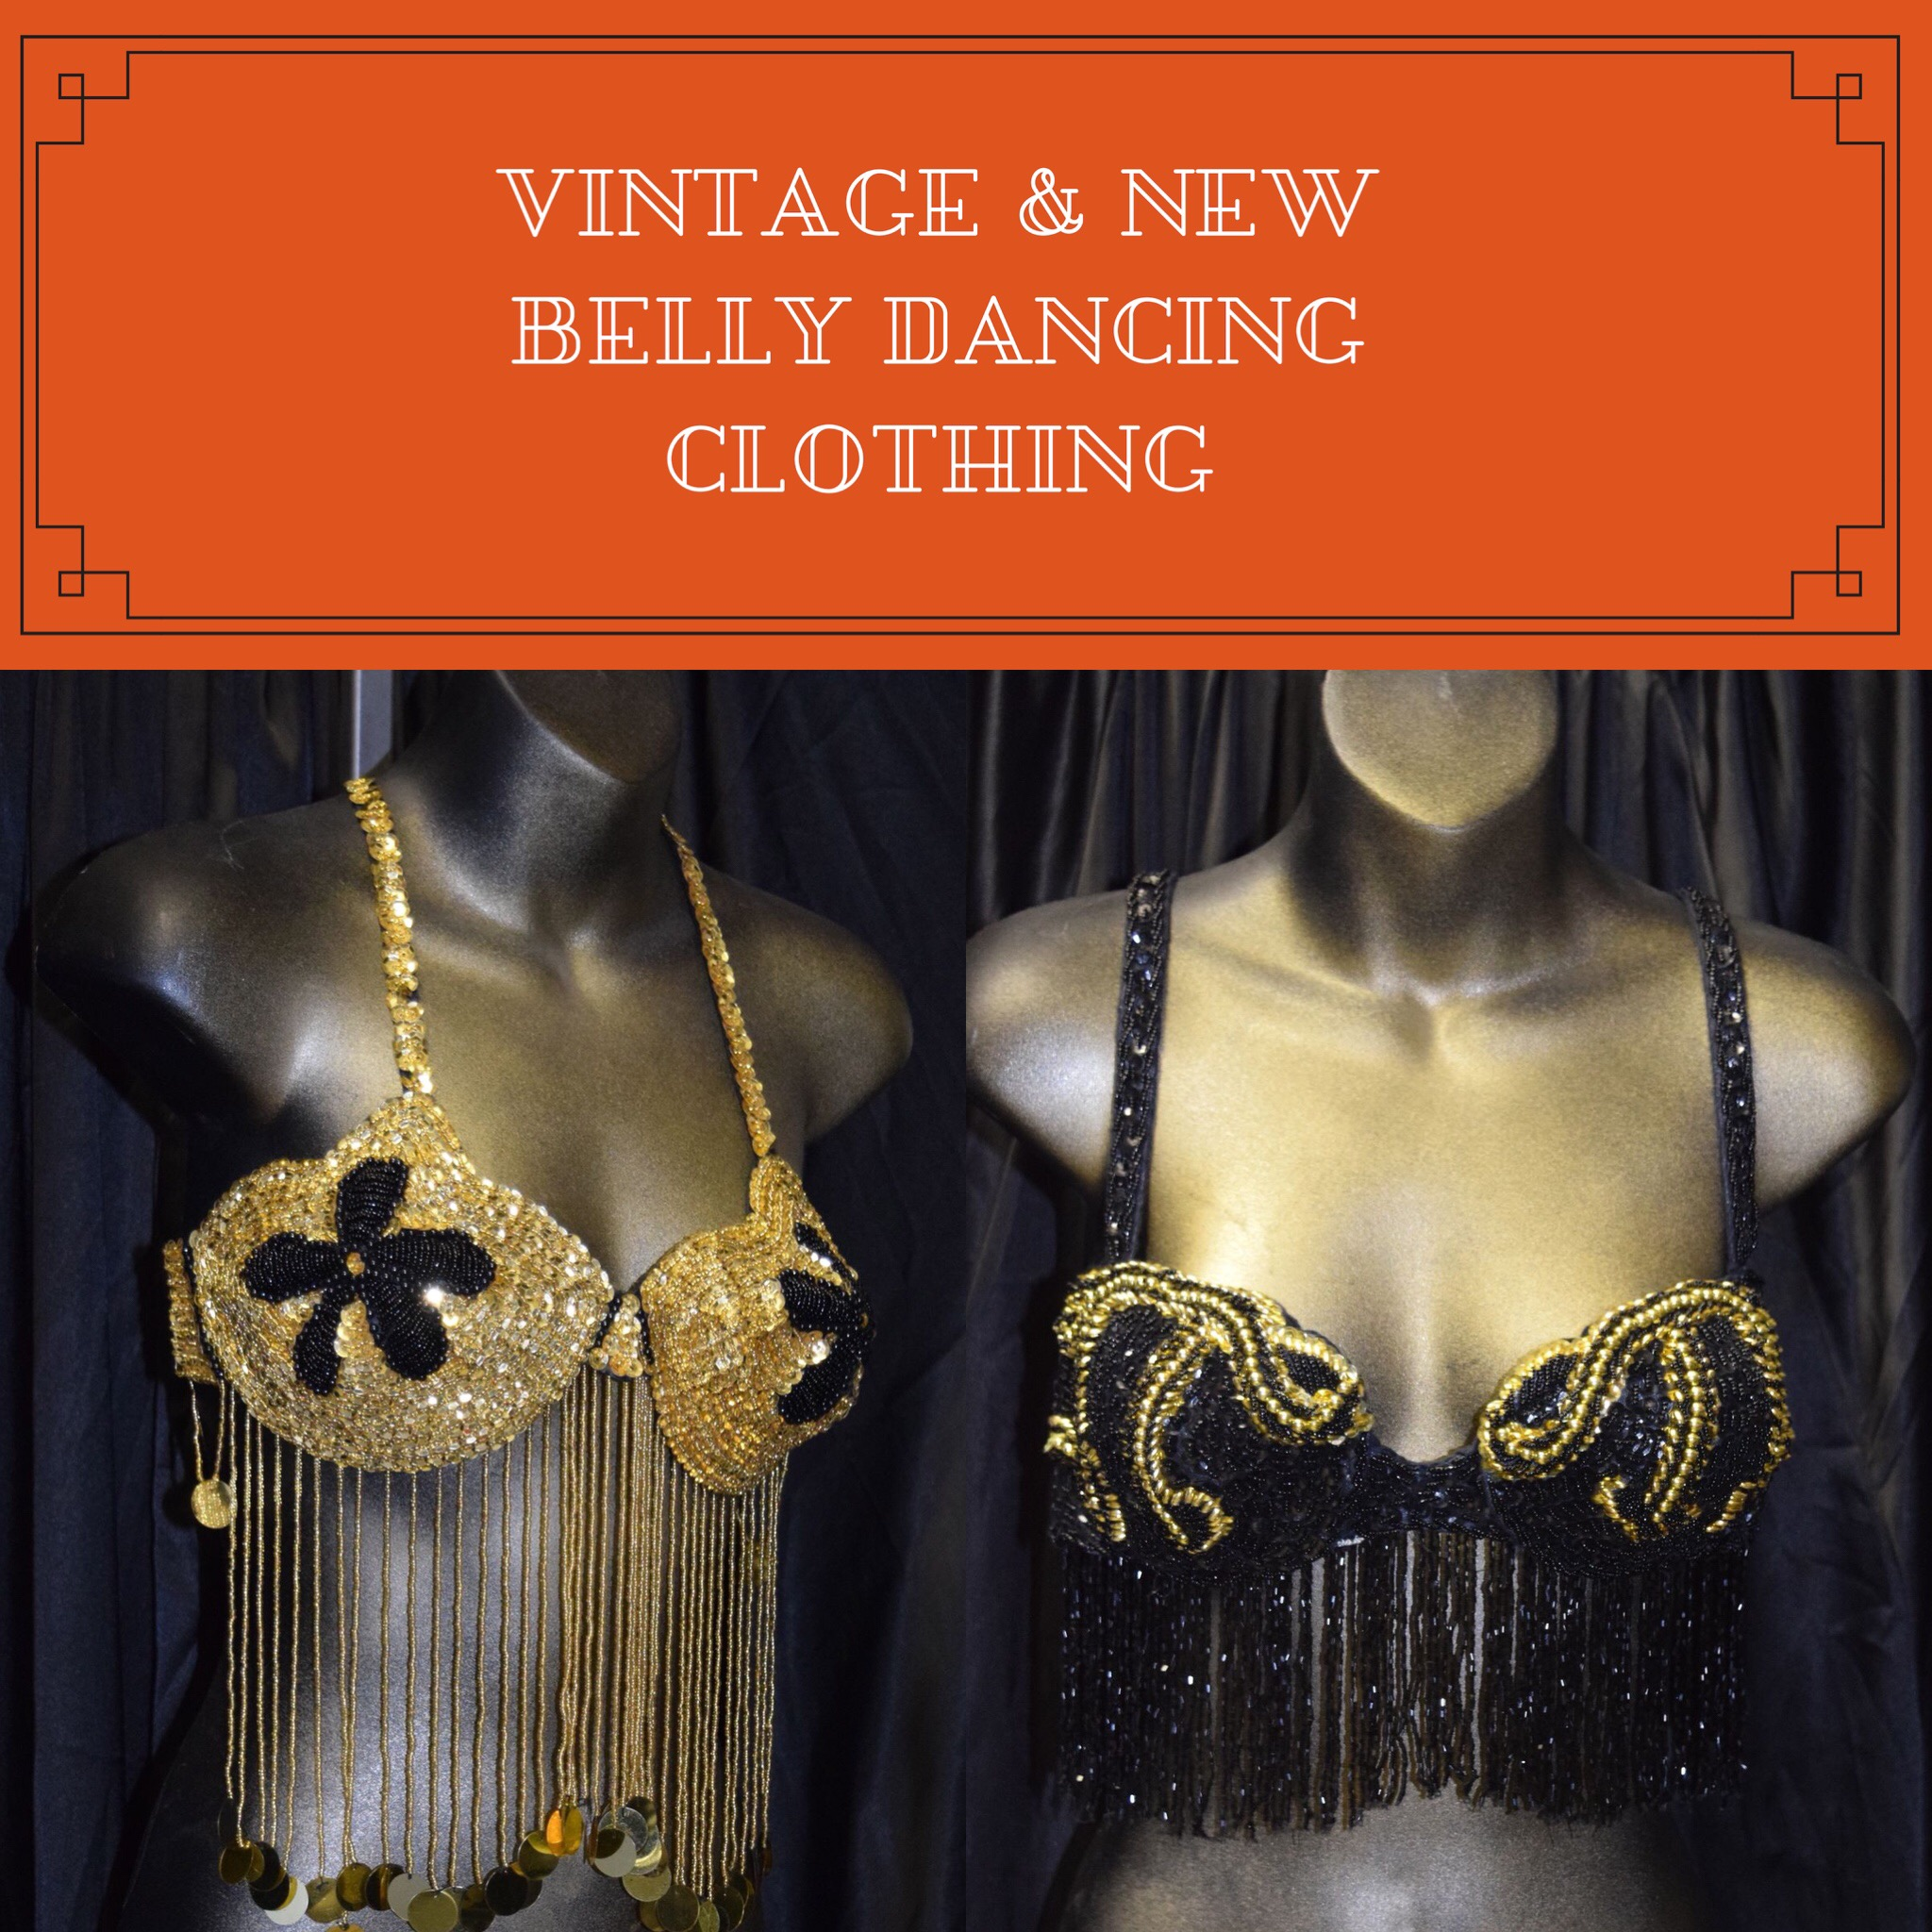 Vintage Belly Dancing Clothing